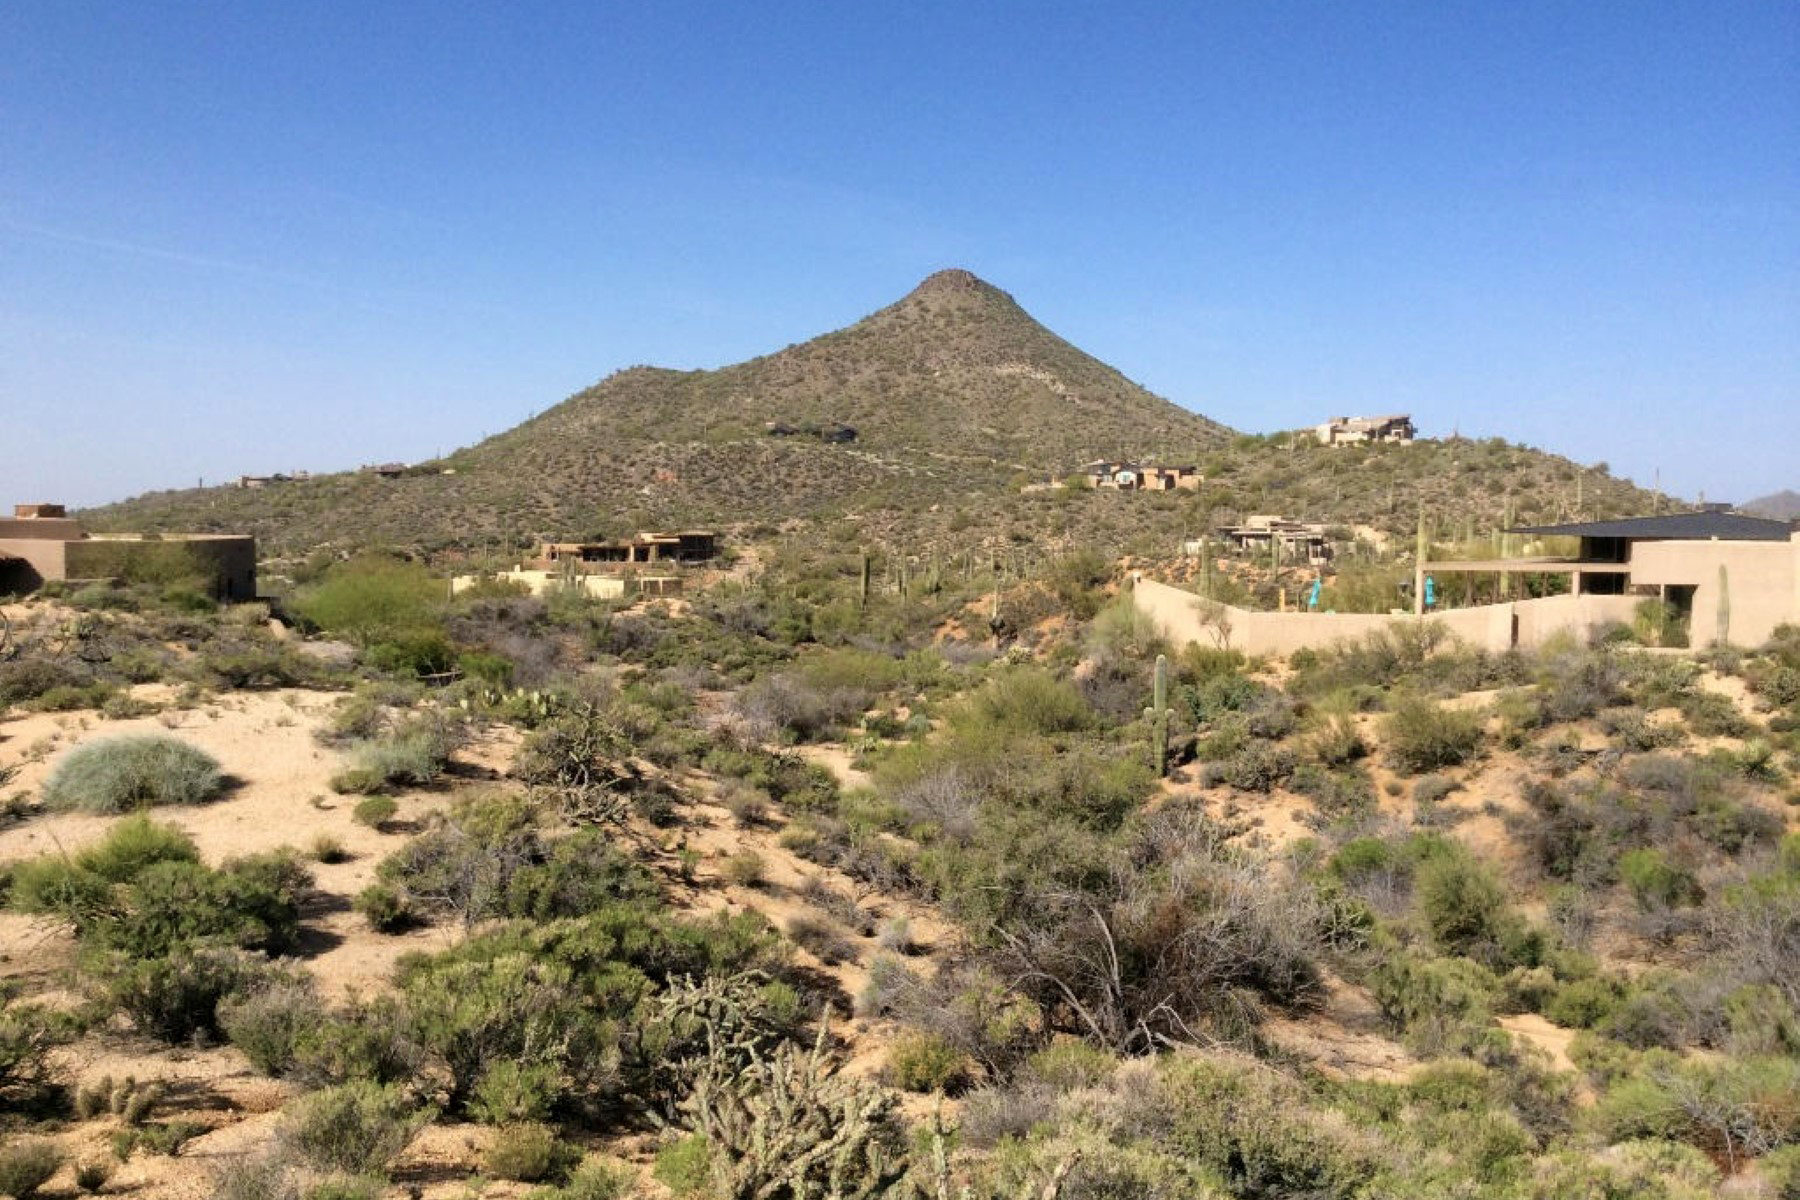 Land for Sale at Privacy & Views on 1.18 Acre Homesite in Desert Mountain 9938 E Groundcherry Lane #29 Scottsdale, Arizona 85262 United States